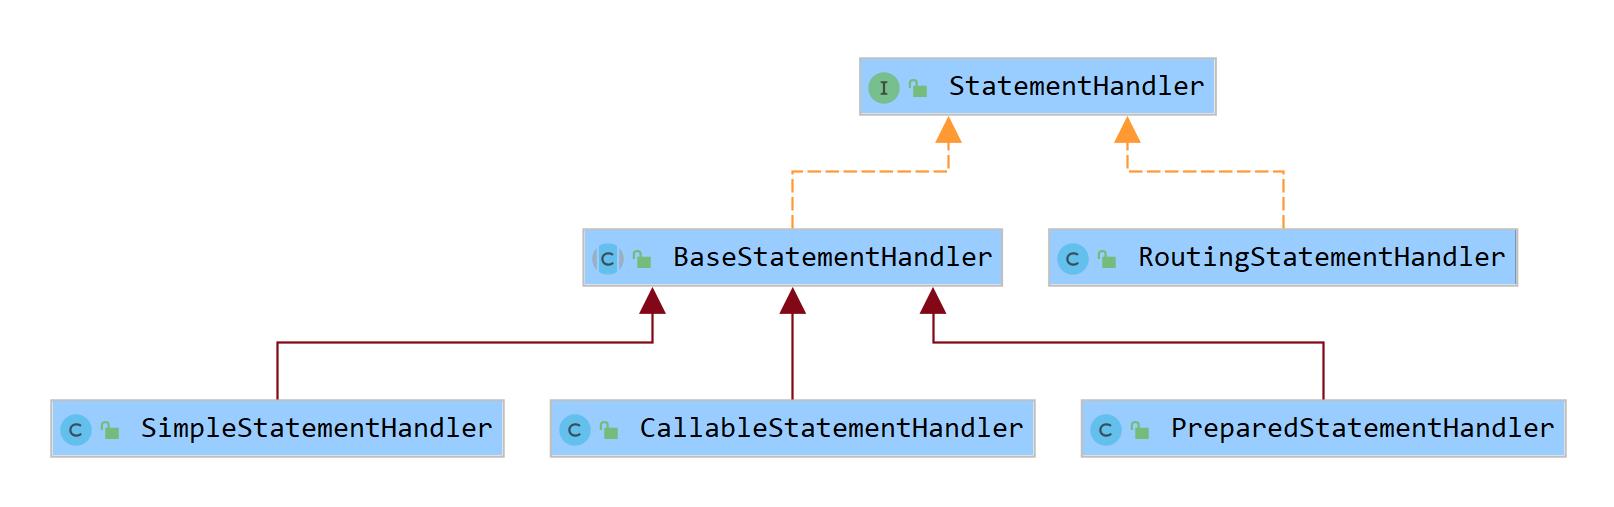 StatementHandler语句处理器接口